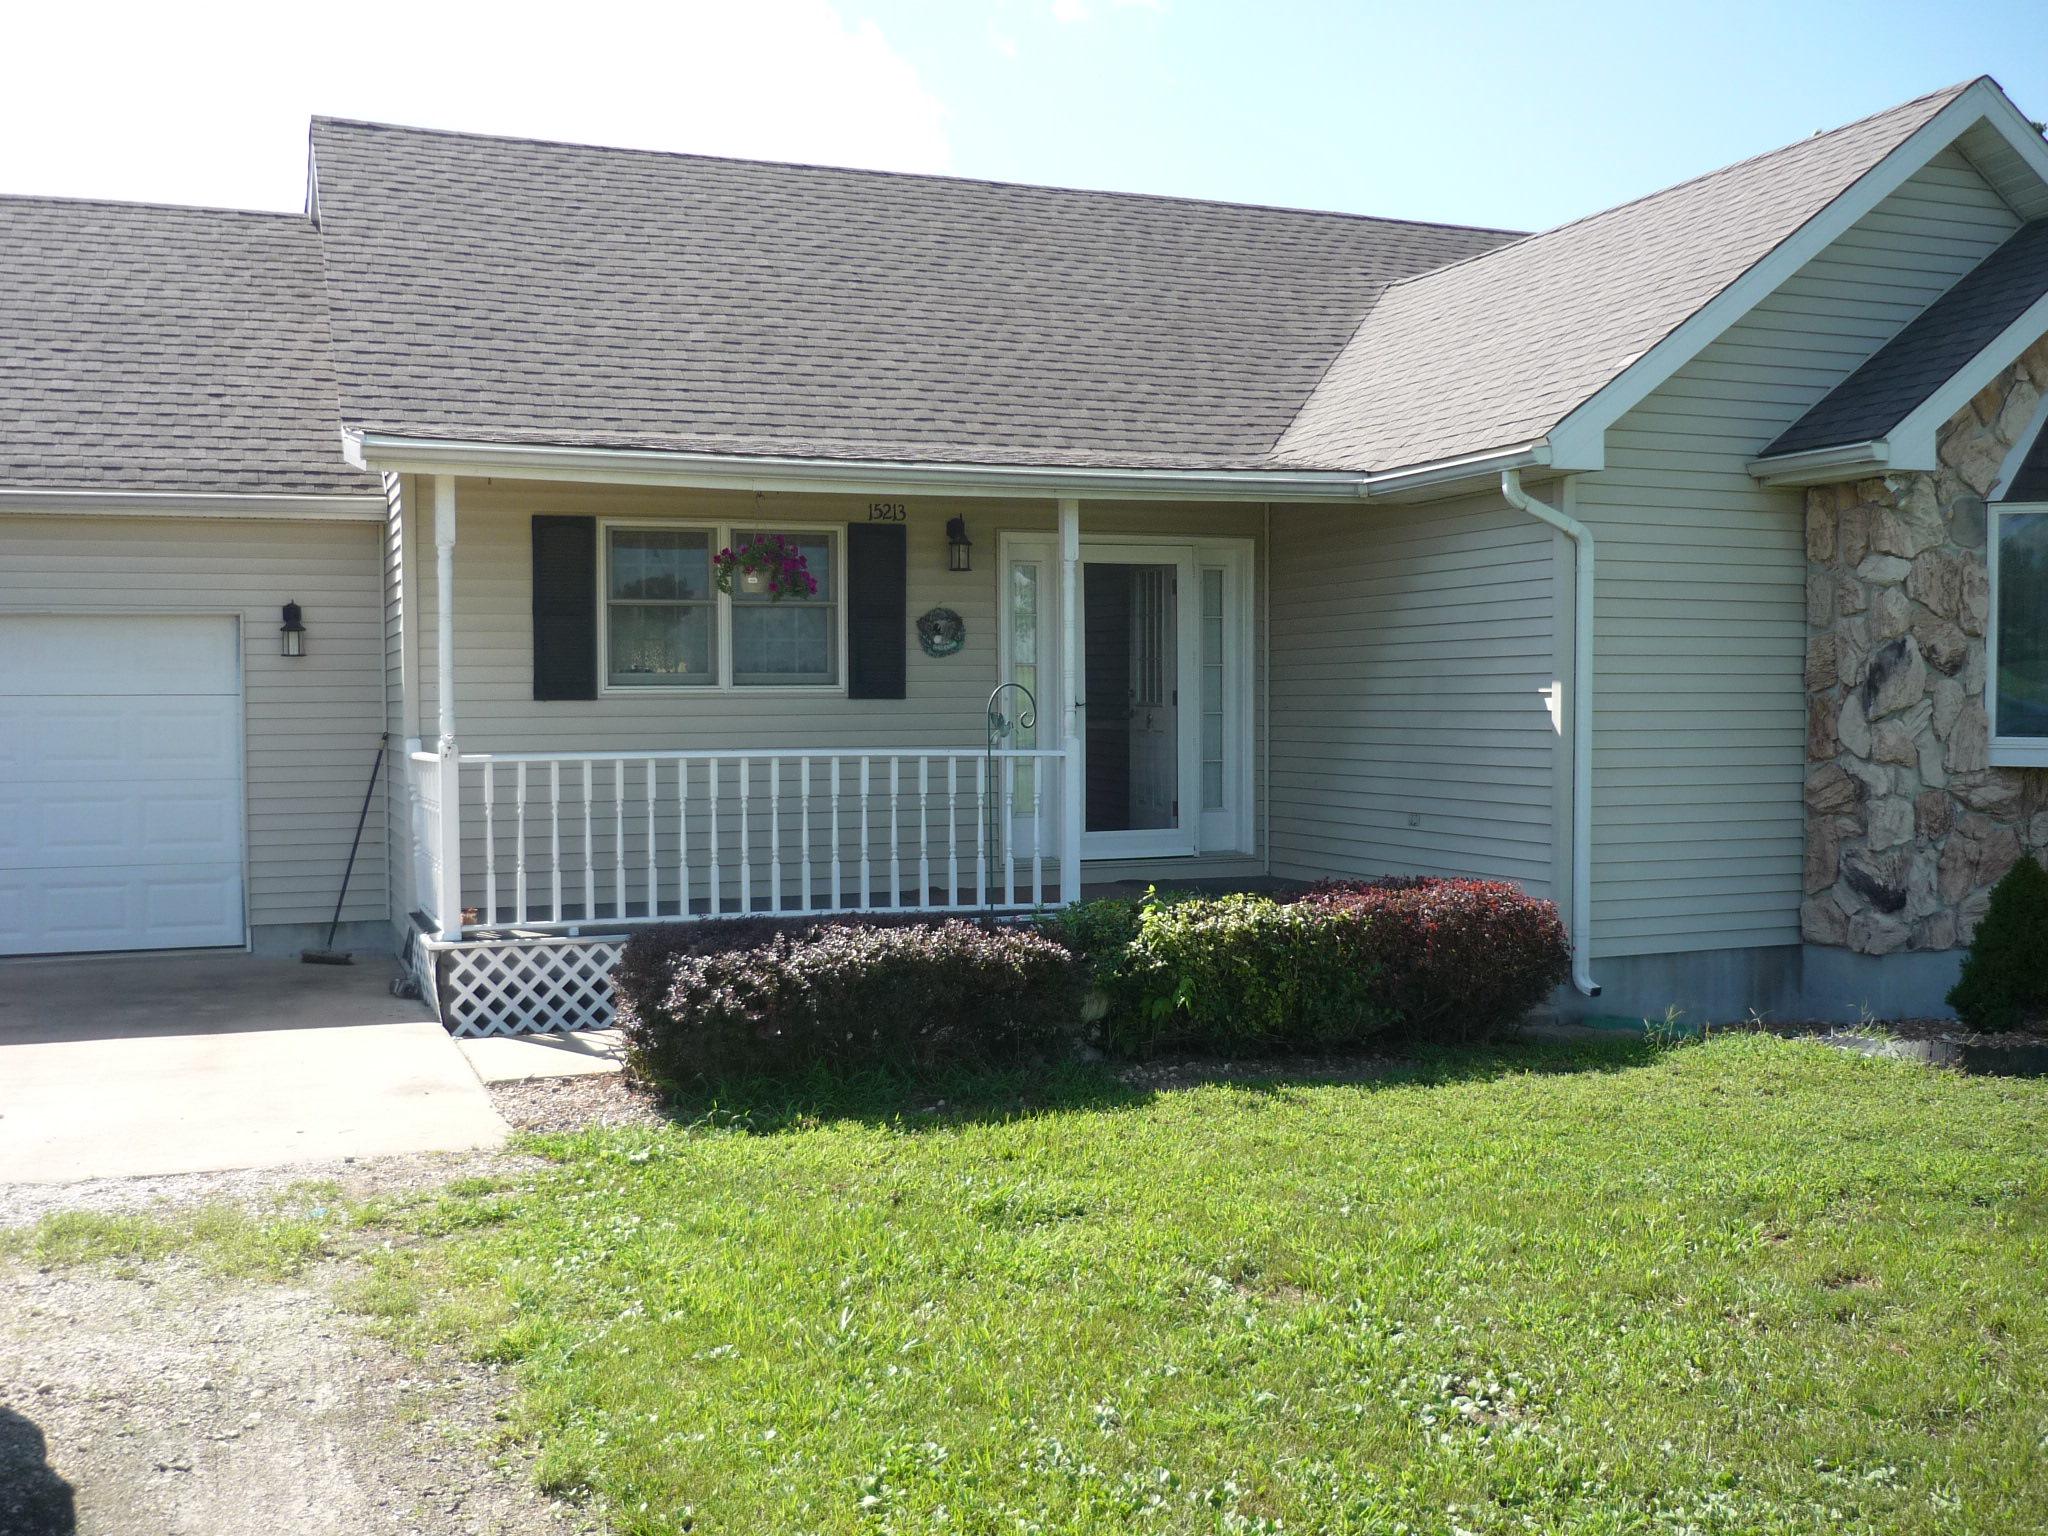 15213 Woodmann Circle, Canton, Missouri 63435